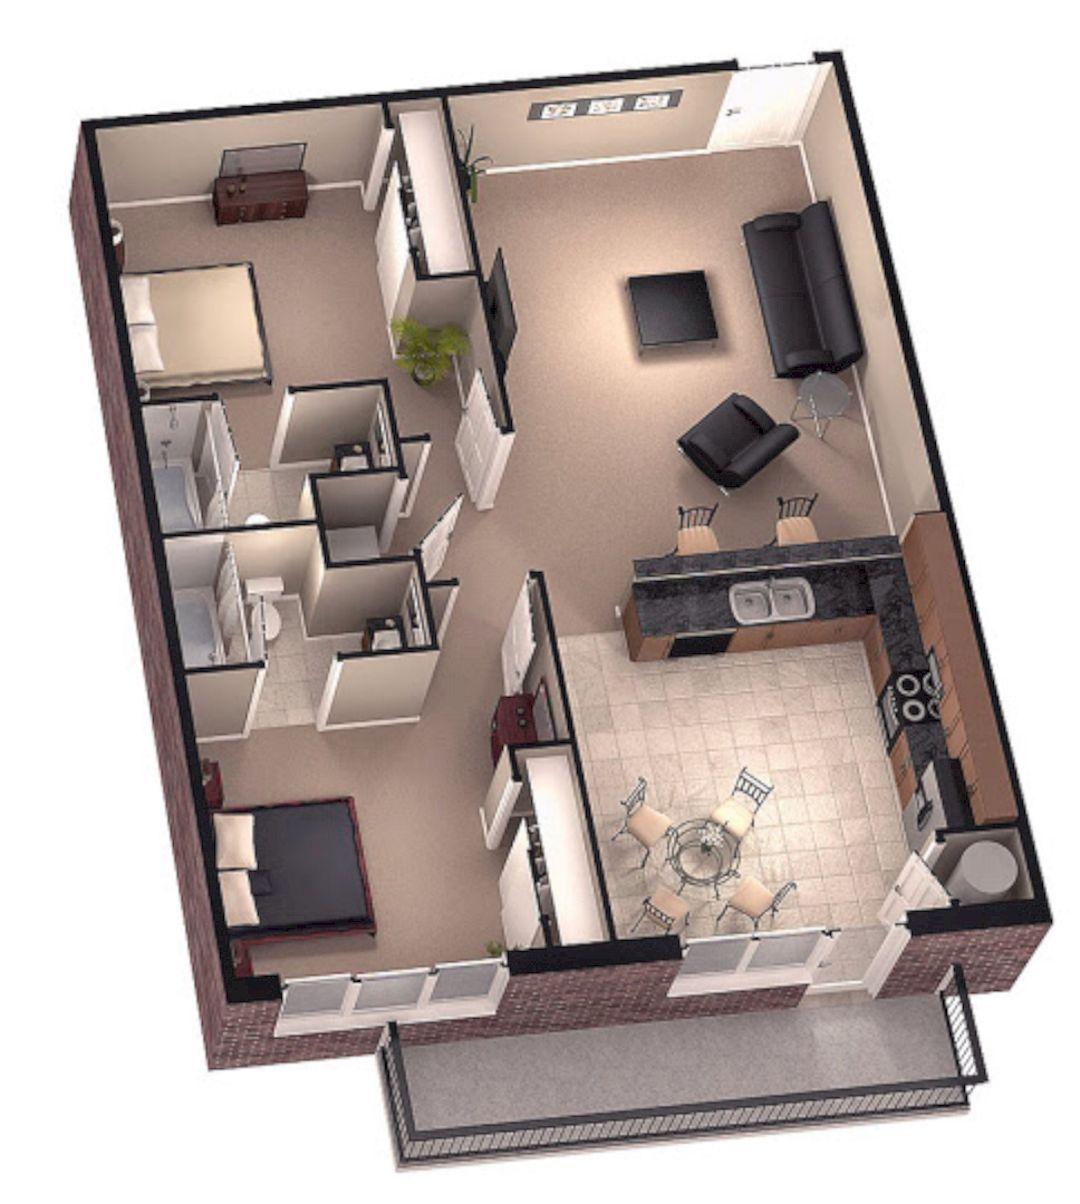 Well designed  house design idea bedroom apartment floor plan also ideas architecture pinterest rh co